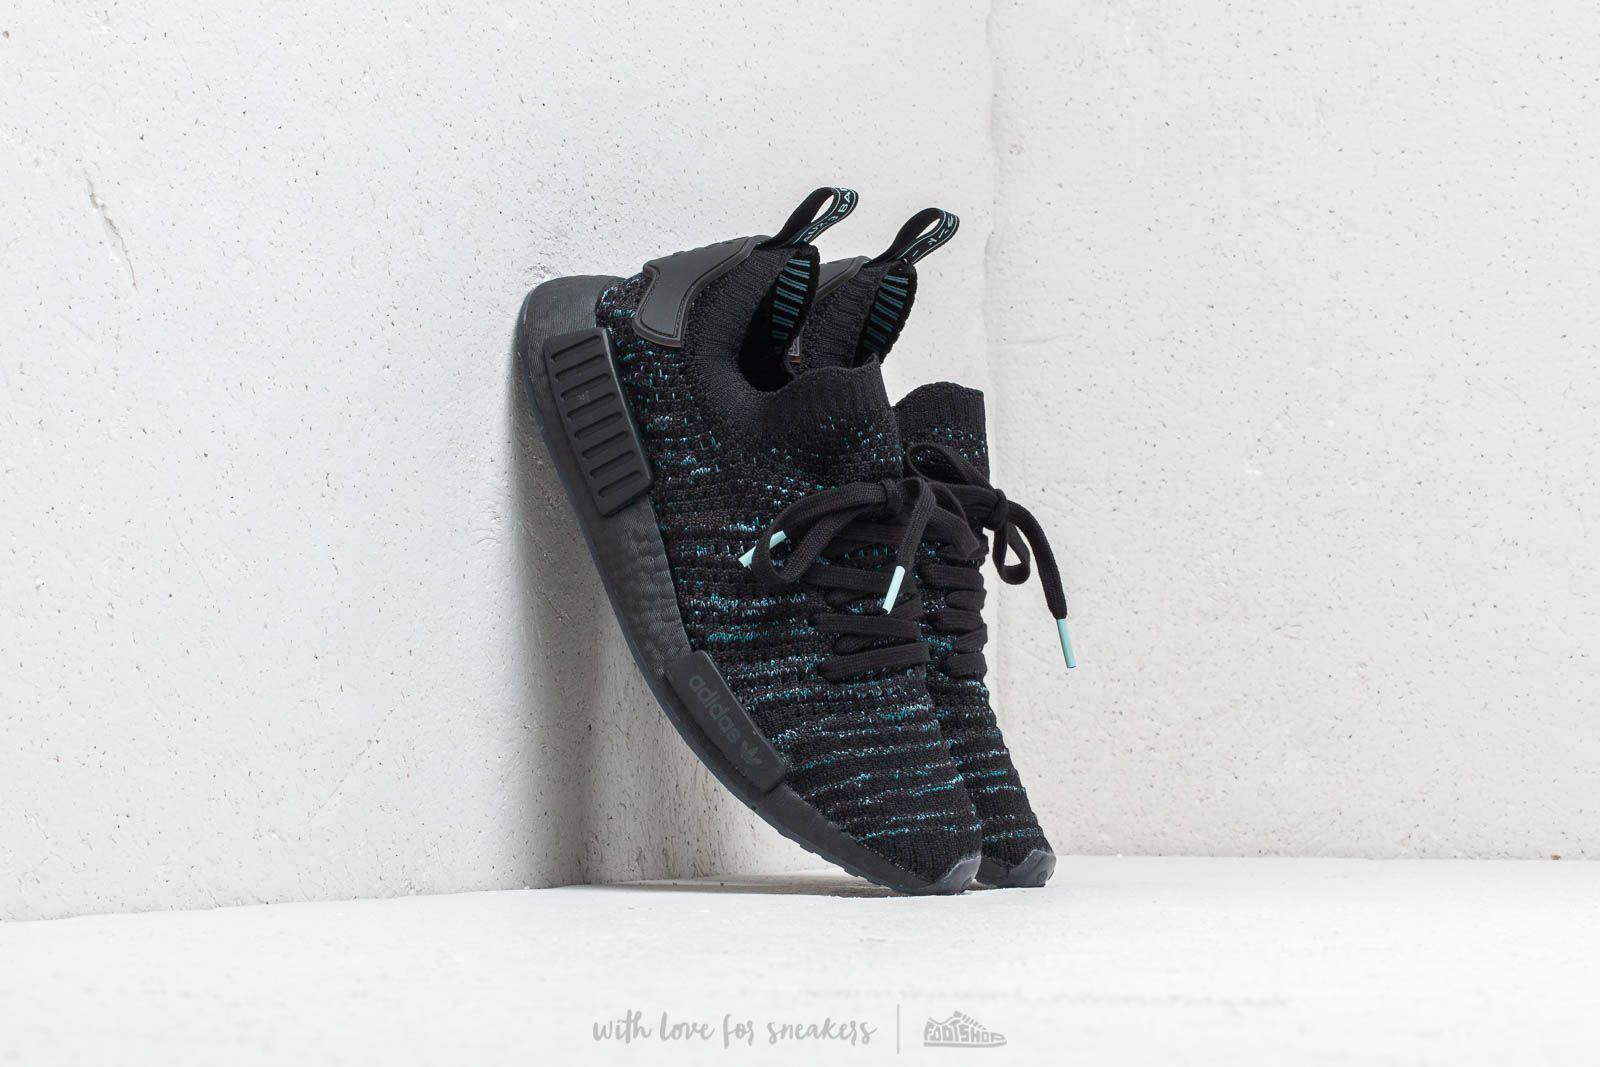 wholesale dealer 852c3 66a46 adidas Originals. Men s Adidas X Parley Nmd r1 Stlt ...